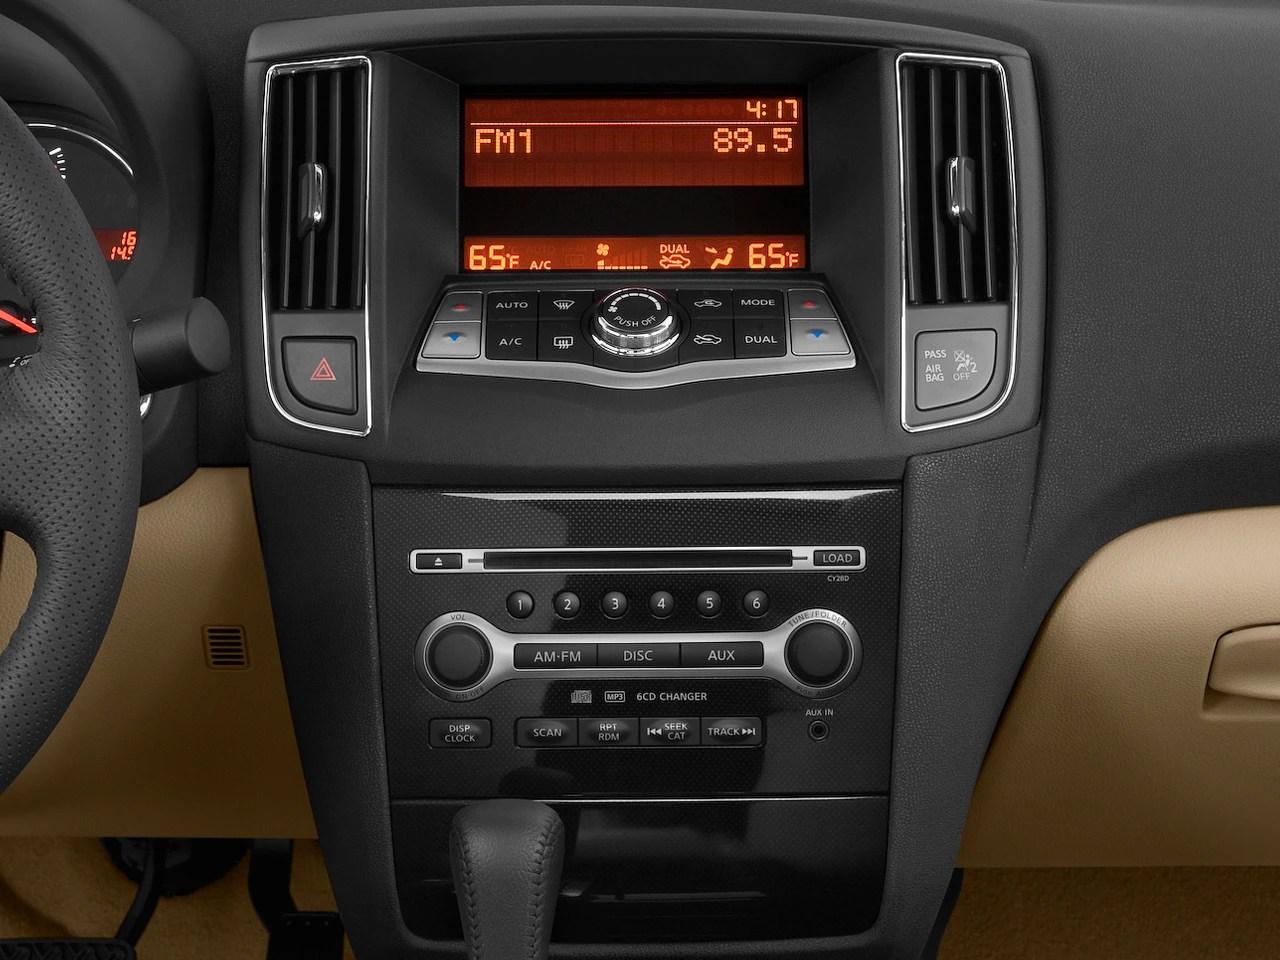 hight resolution of  2005 ford radio aux input jaguar x type radio wiring diagram 150cc jaguar x type radio